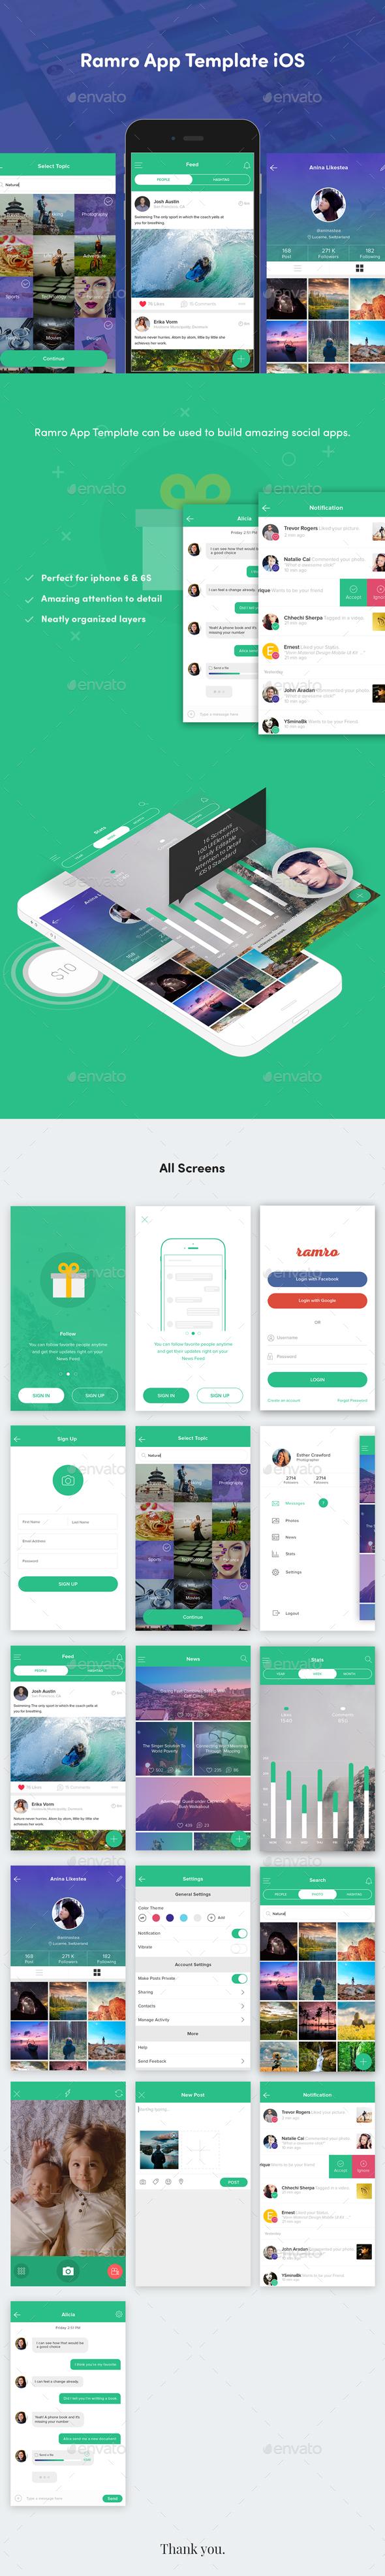 Ramro App Template iOS (User Interfaces)